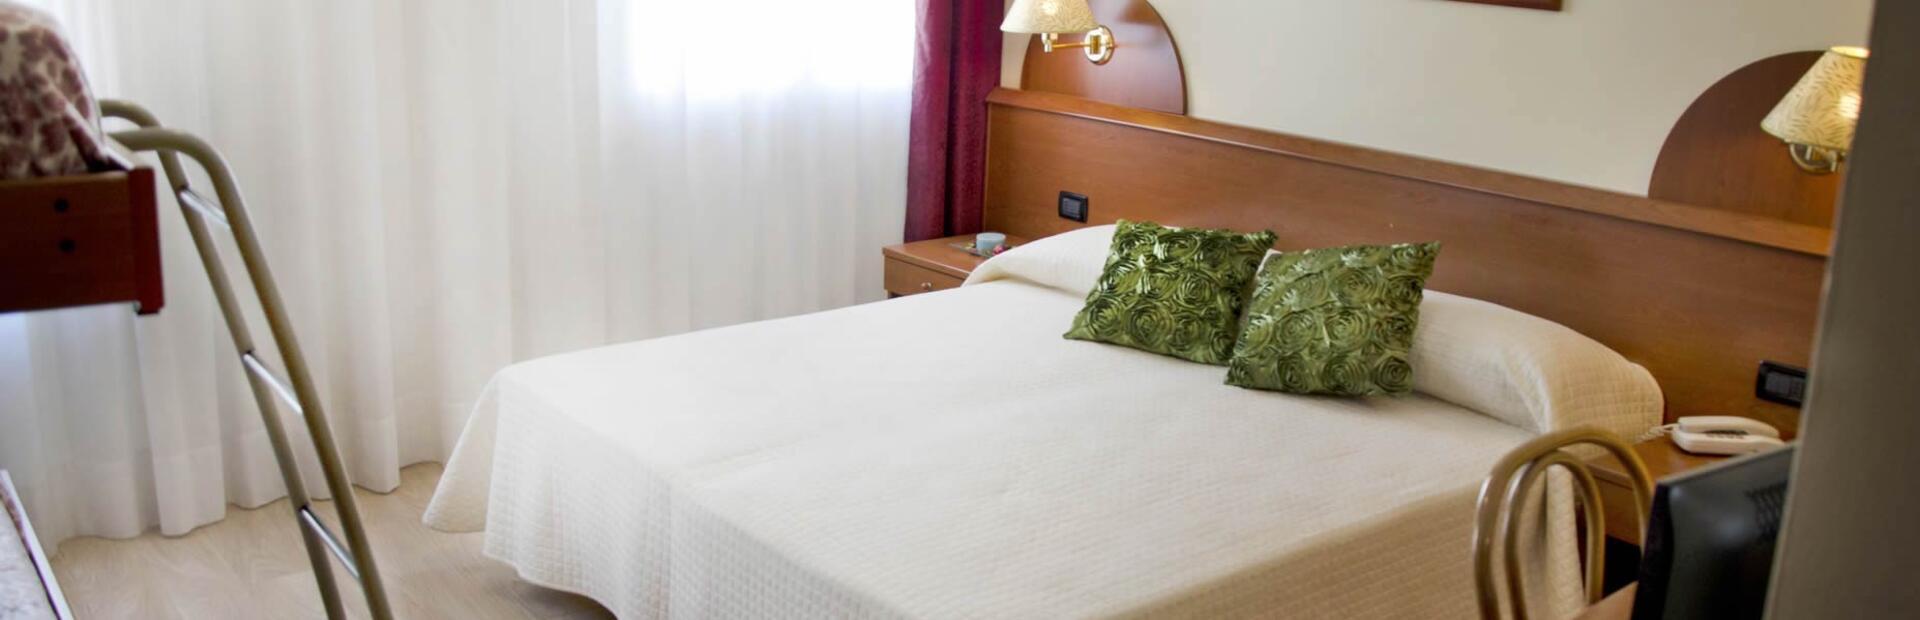 hotel-sole de quadrupel-zimmer 001